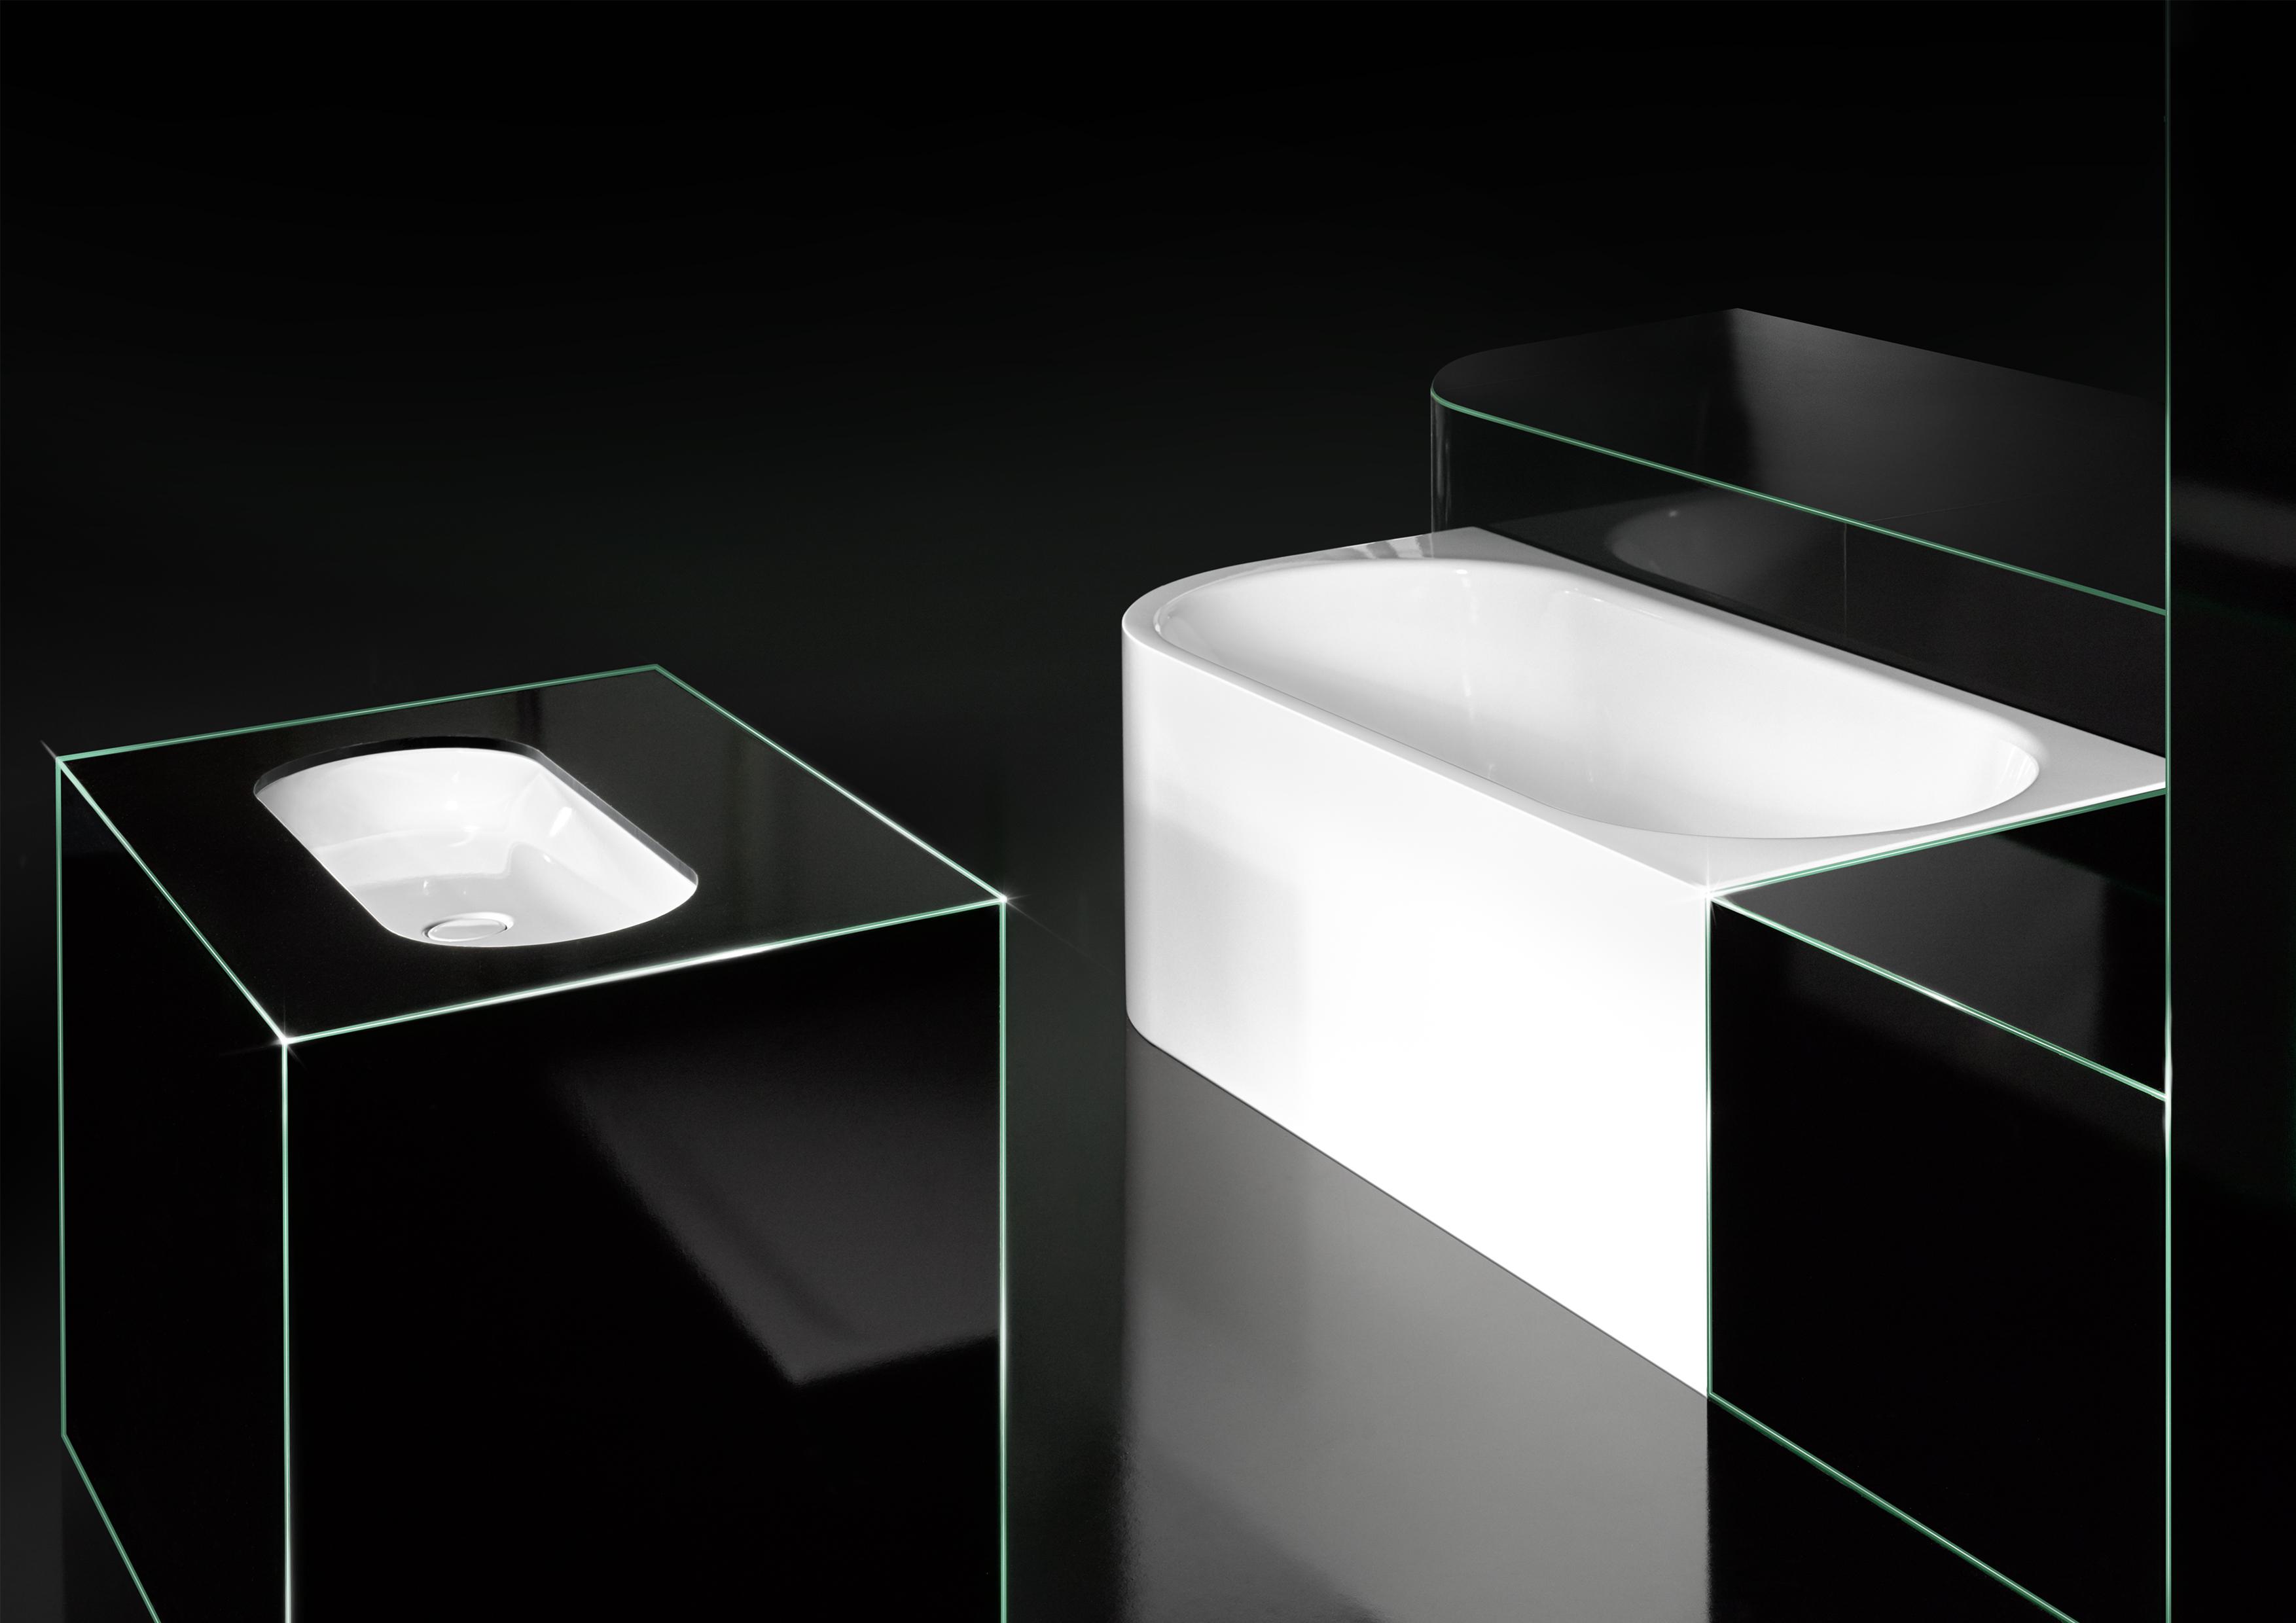 kaldewei detail kaldewei badewanne duschwanne. Black Bedroom Furniture Sets. Home Design Ideas